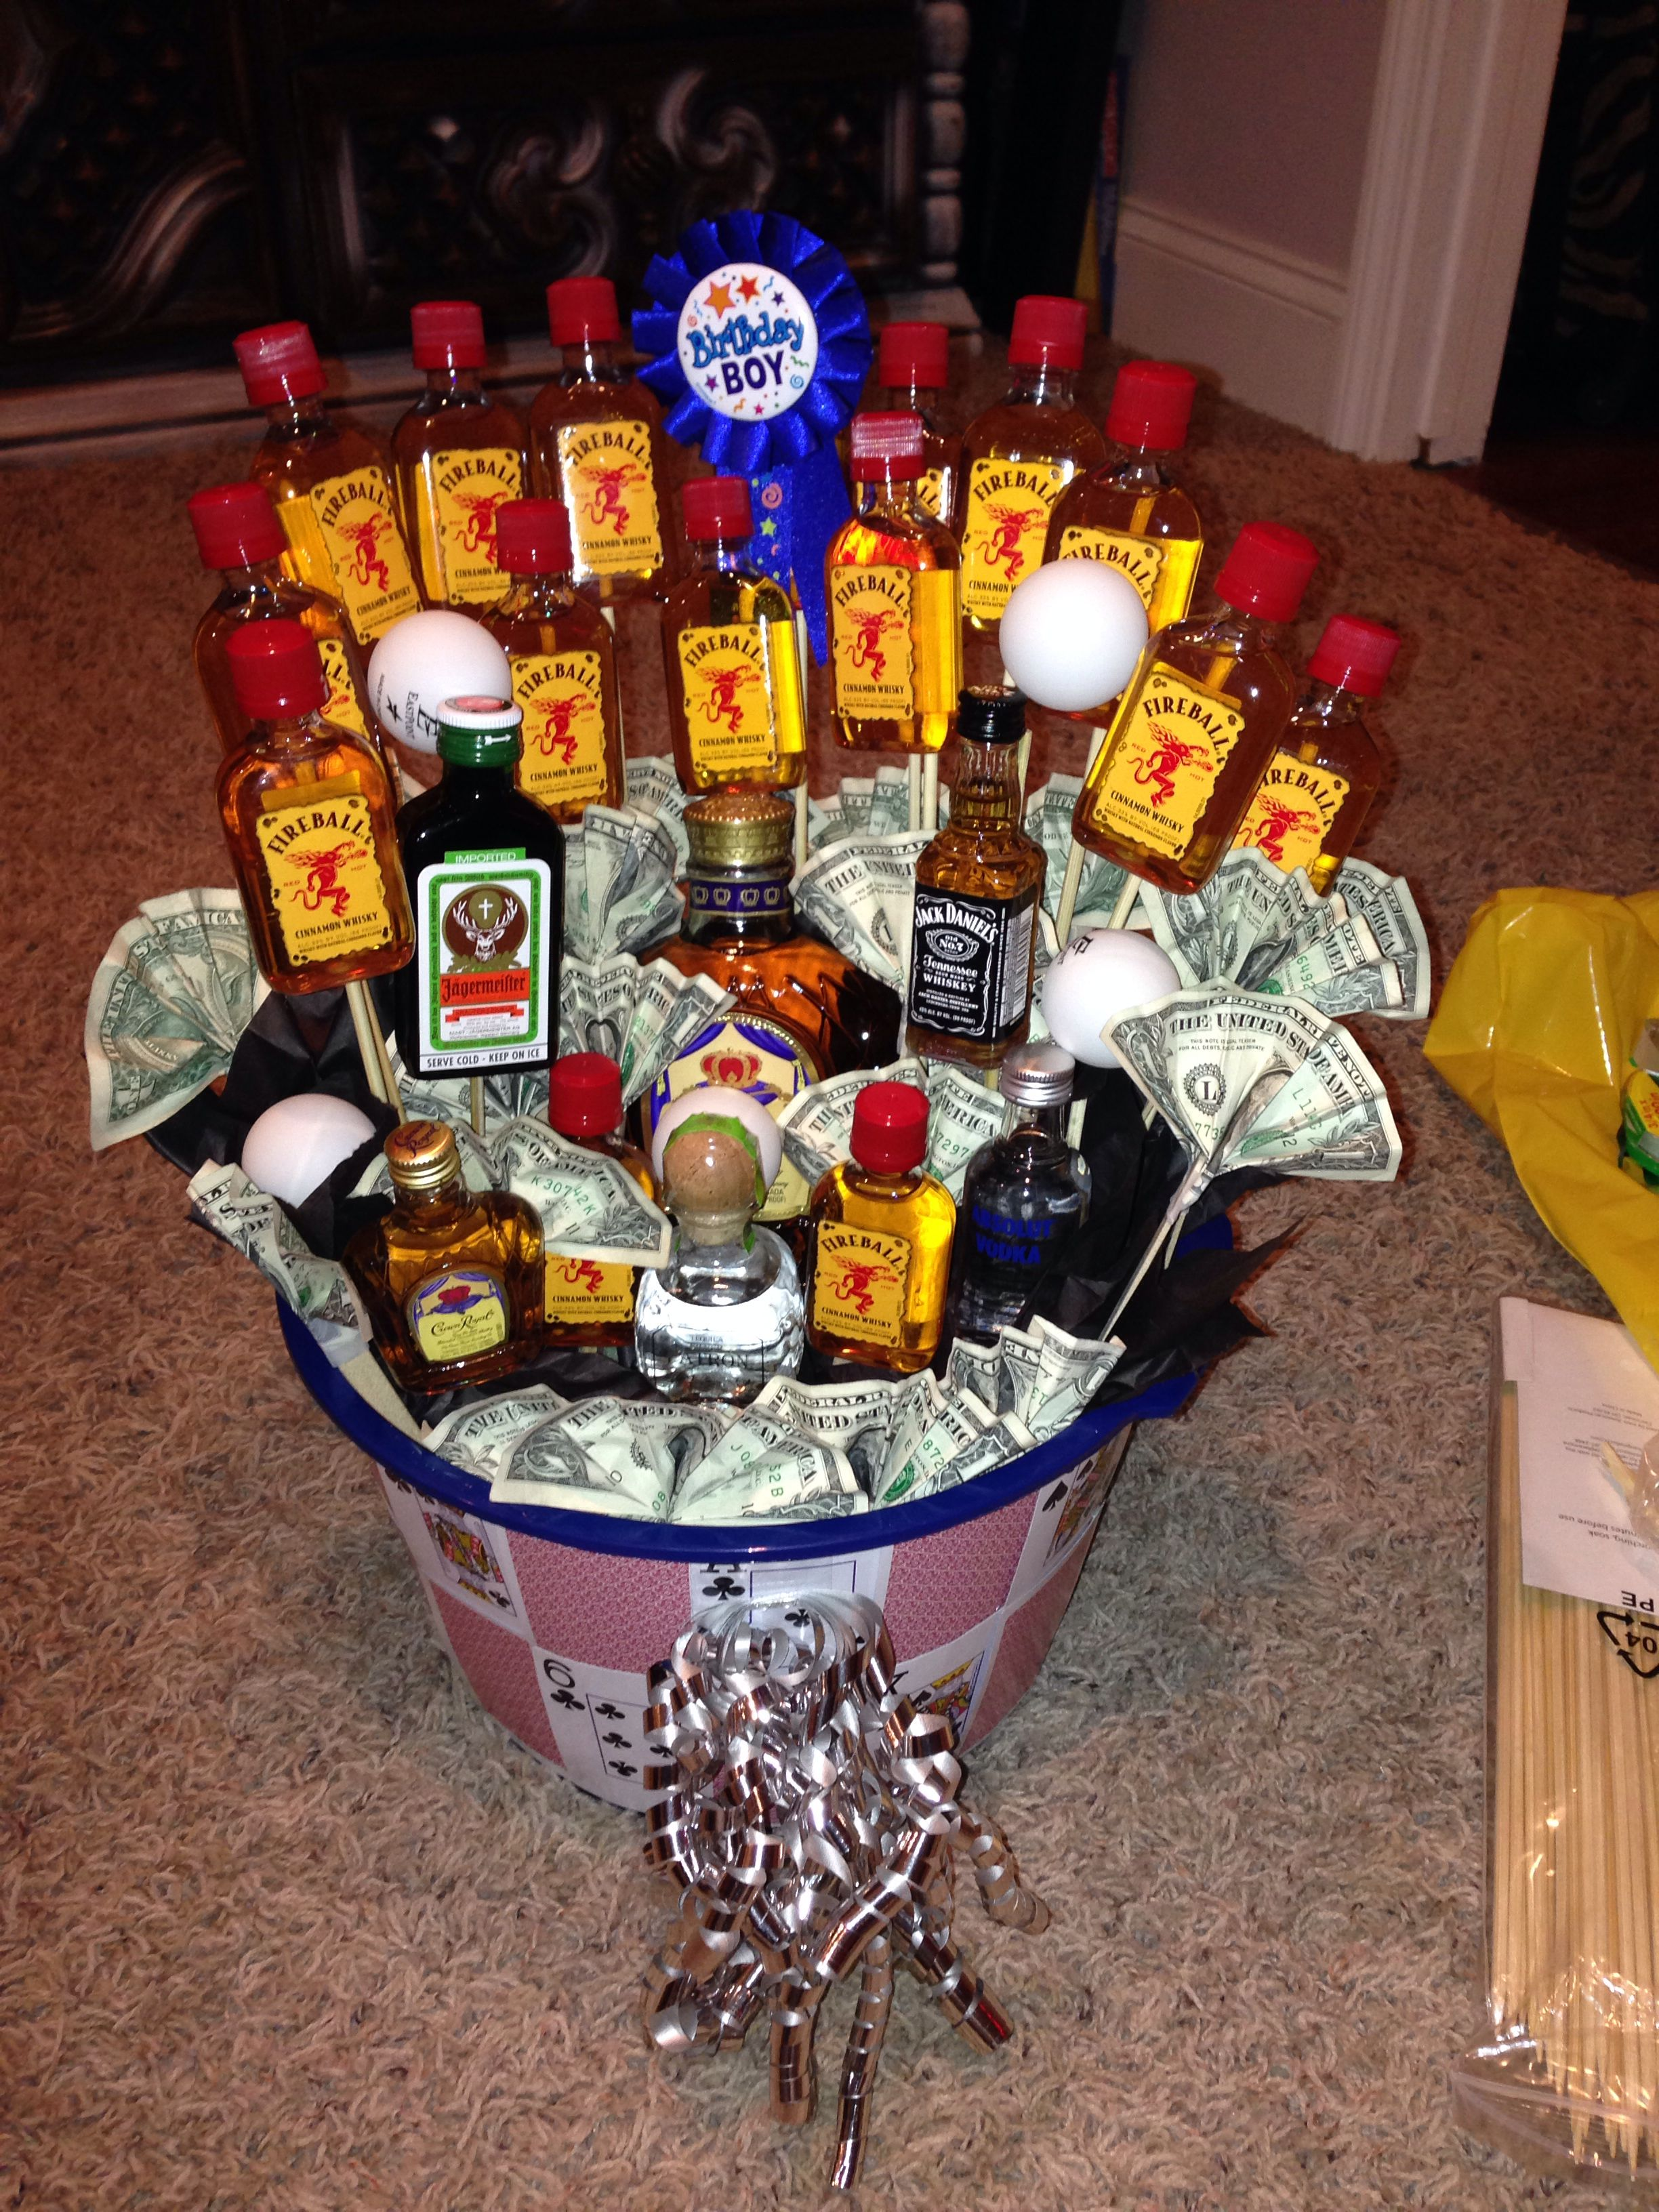 21st birthday basket for boyfriend! DIY; get crafty